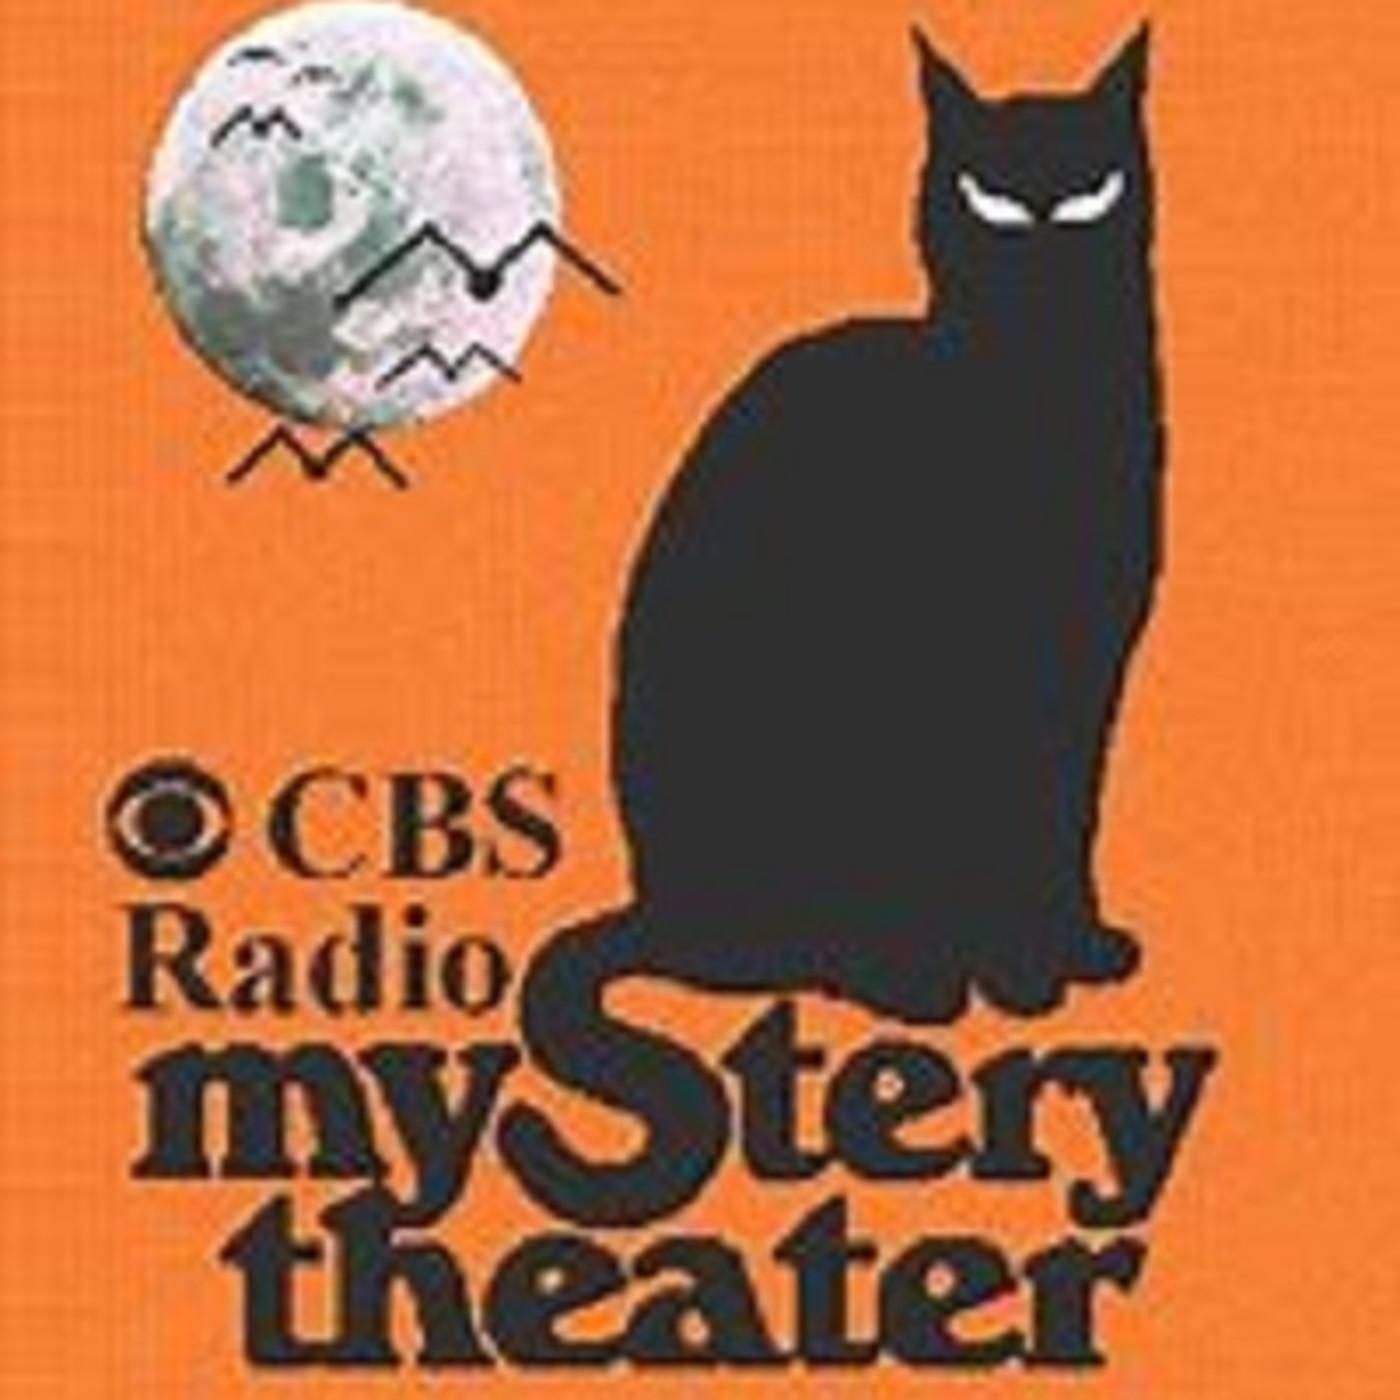 CBS Radio Mystery Theater_79-09-26_(1016)_The Eighth Day